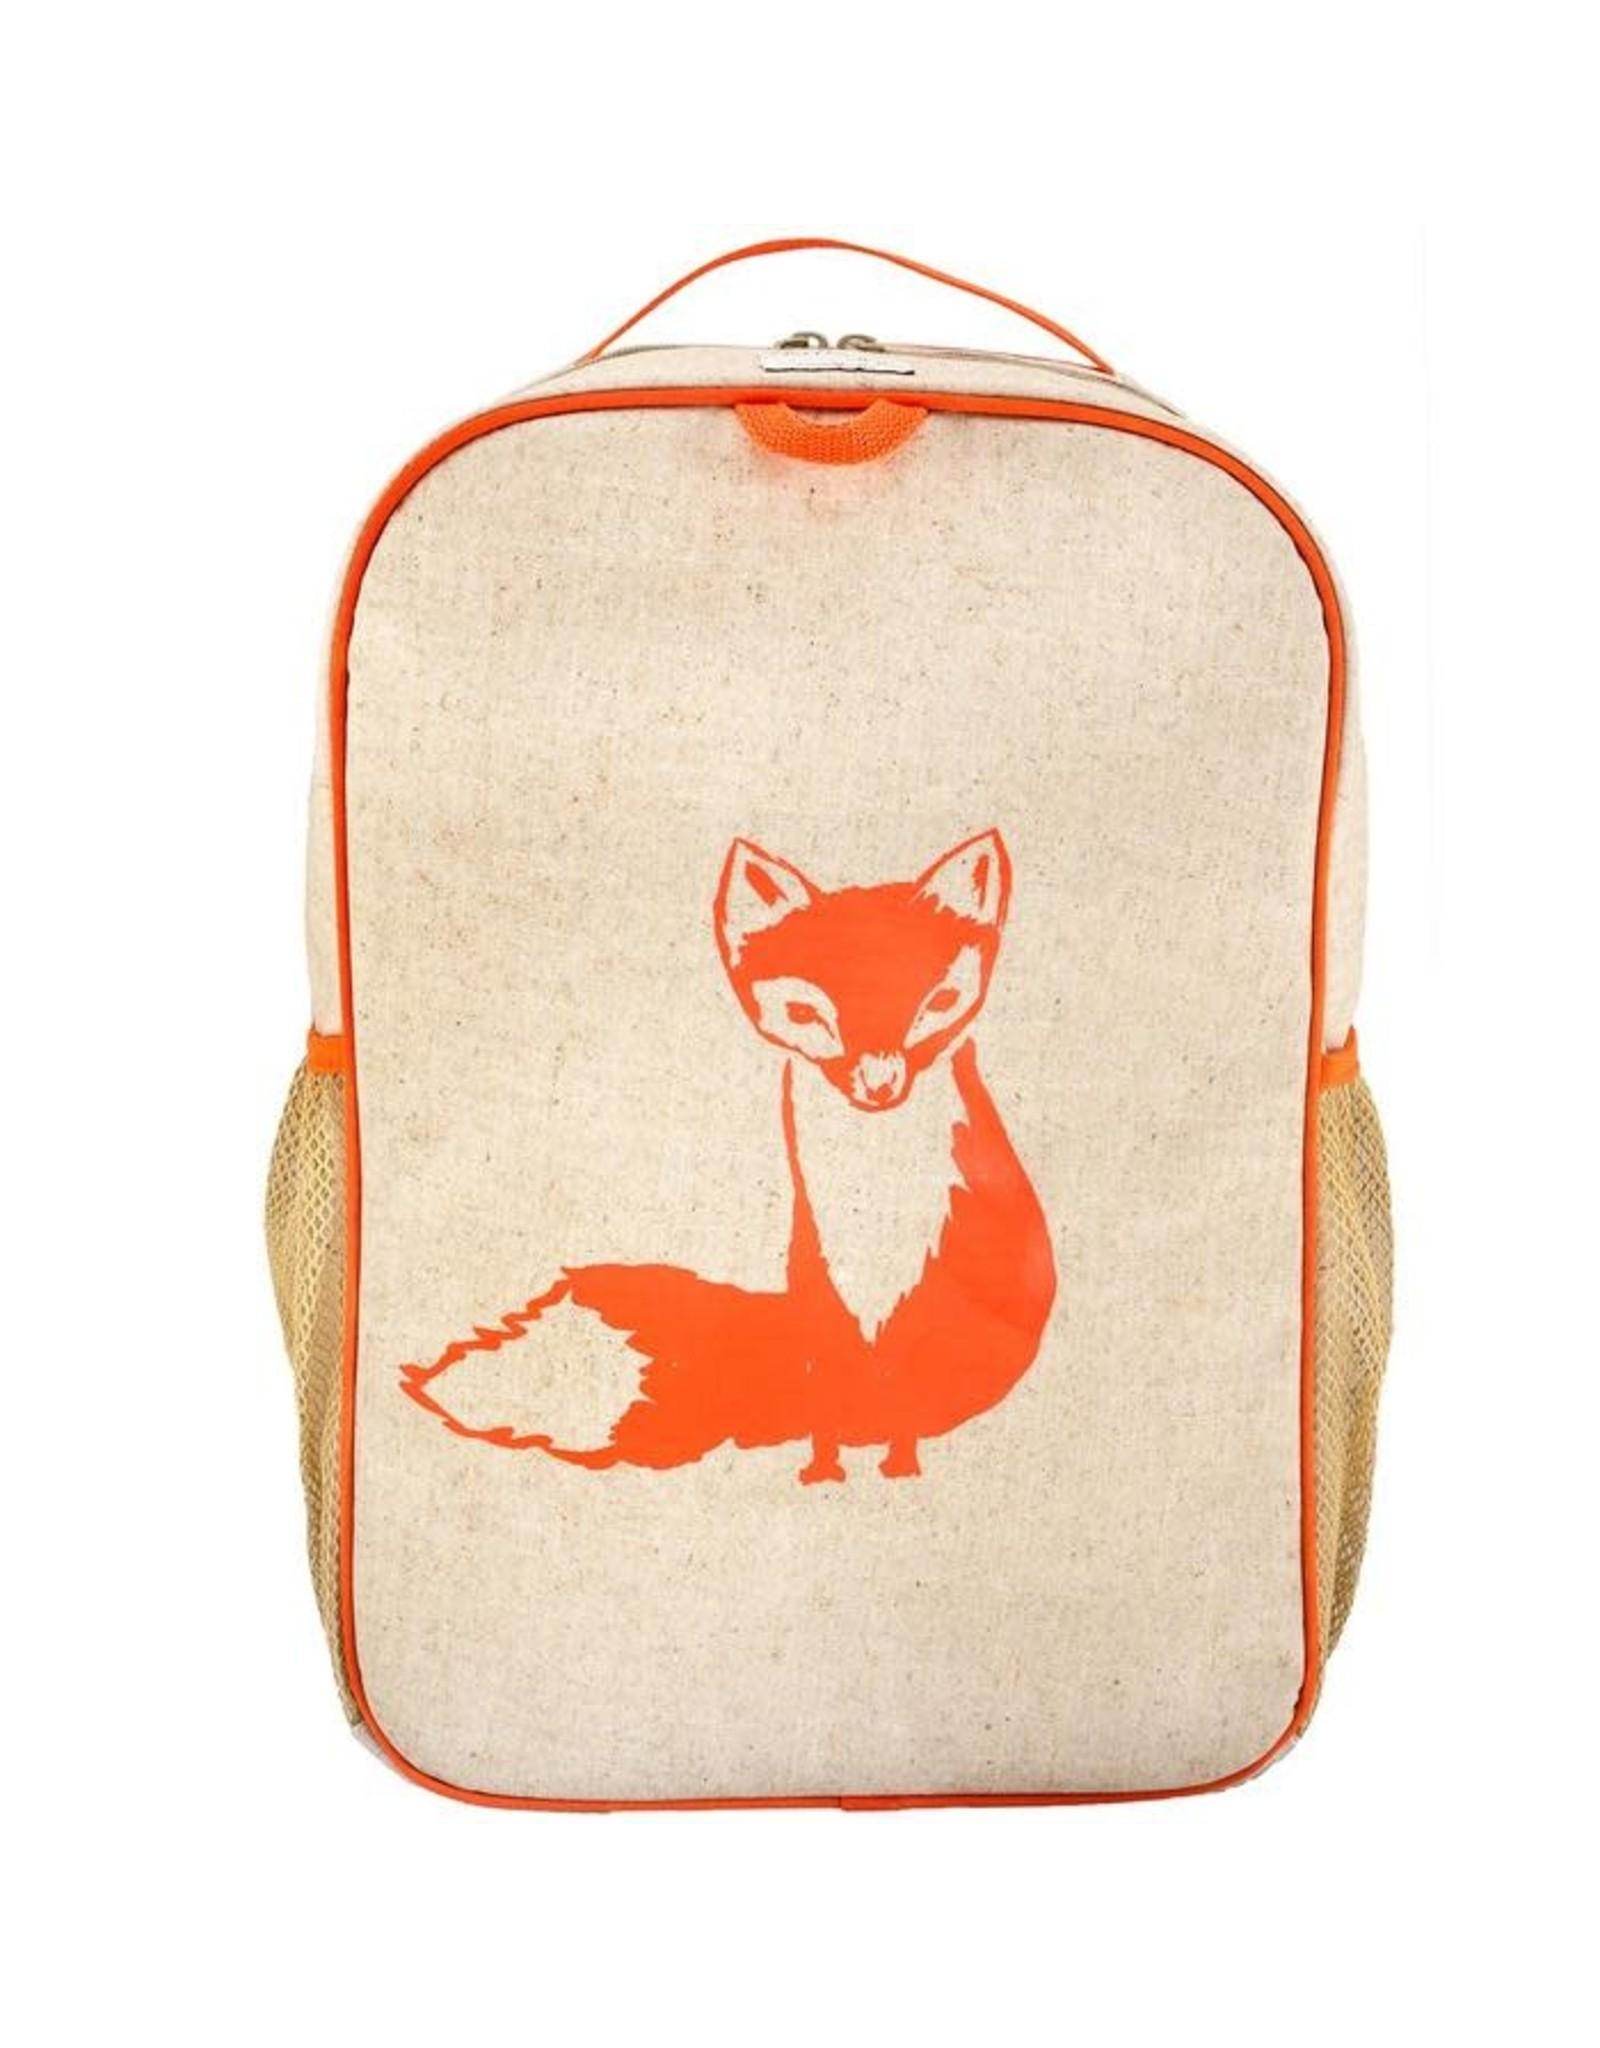 So Young Grade School Backpack, Orange Fox